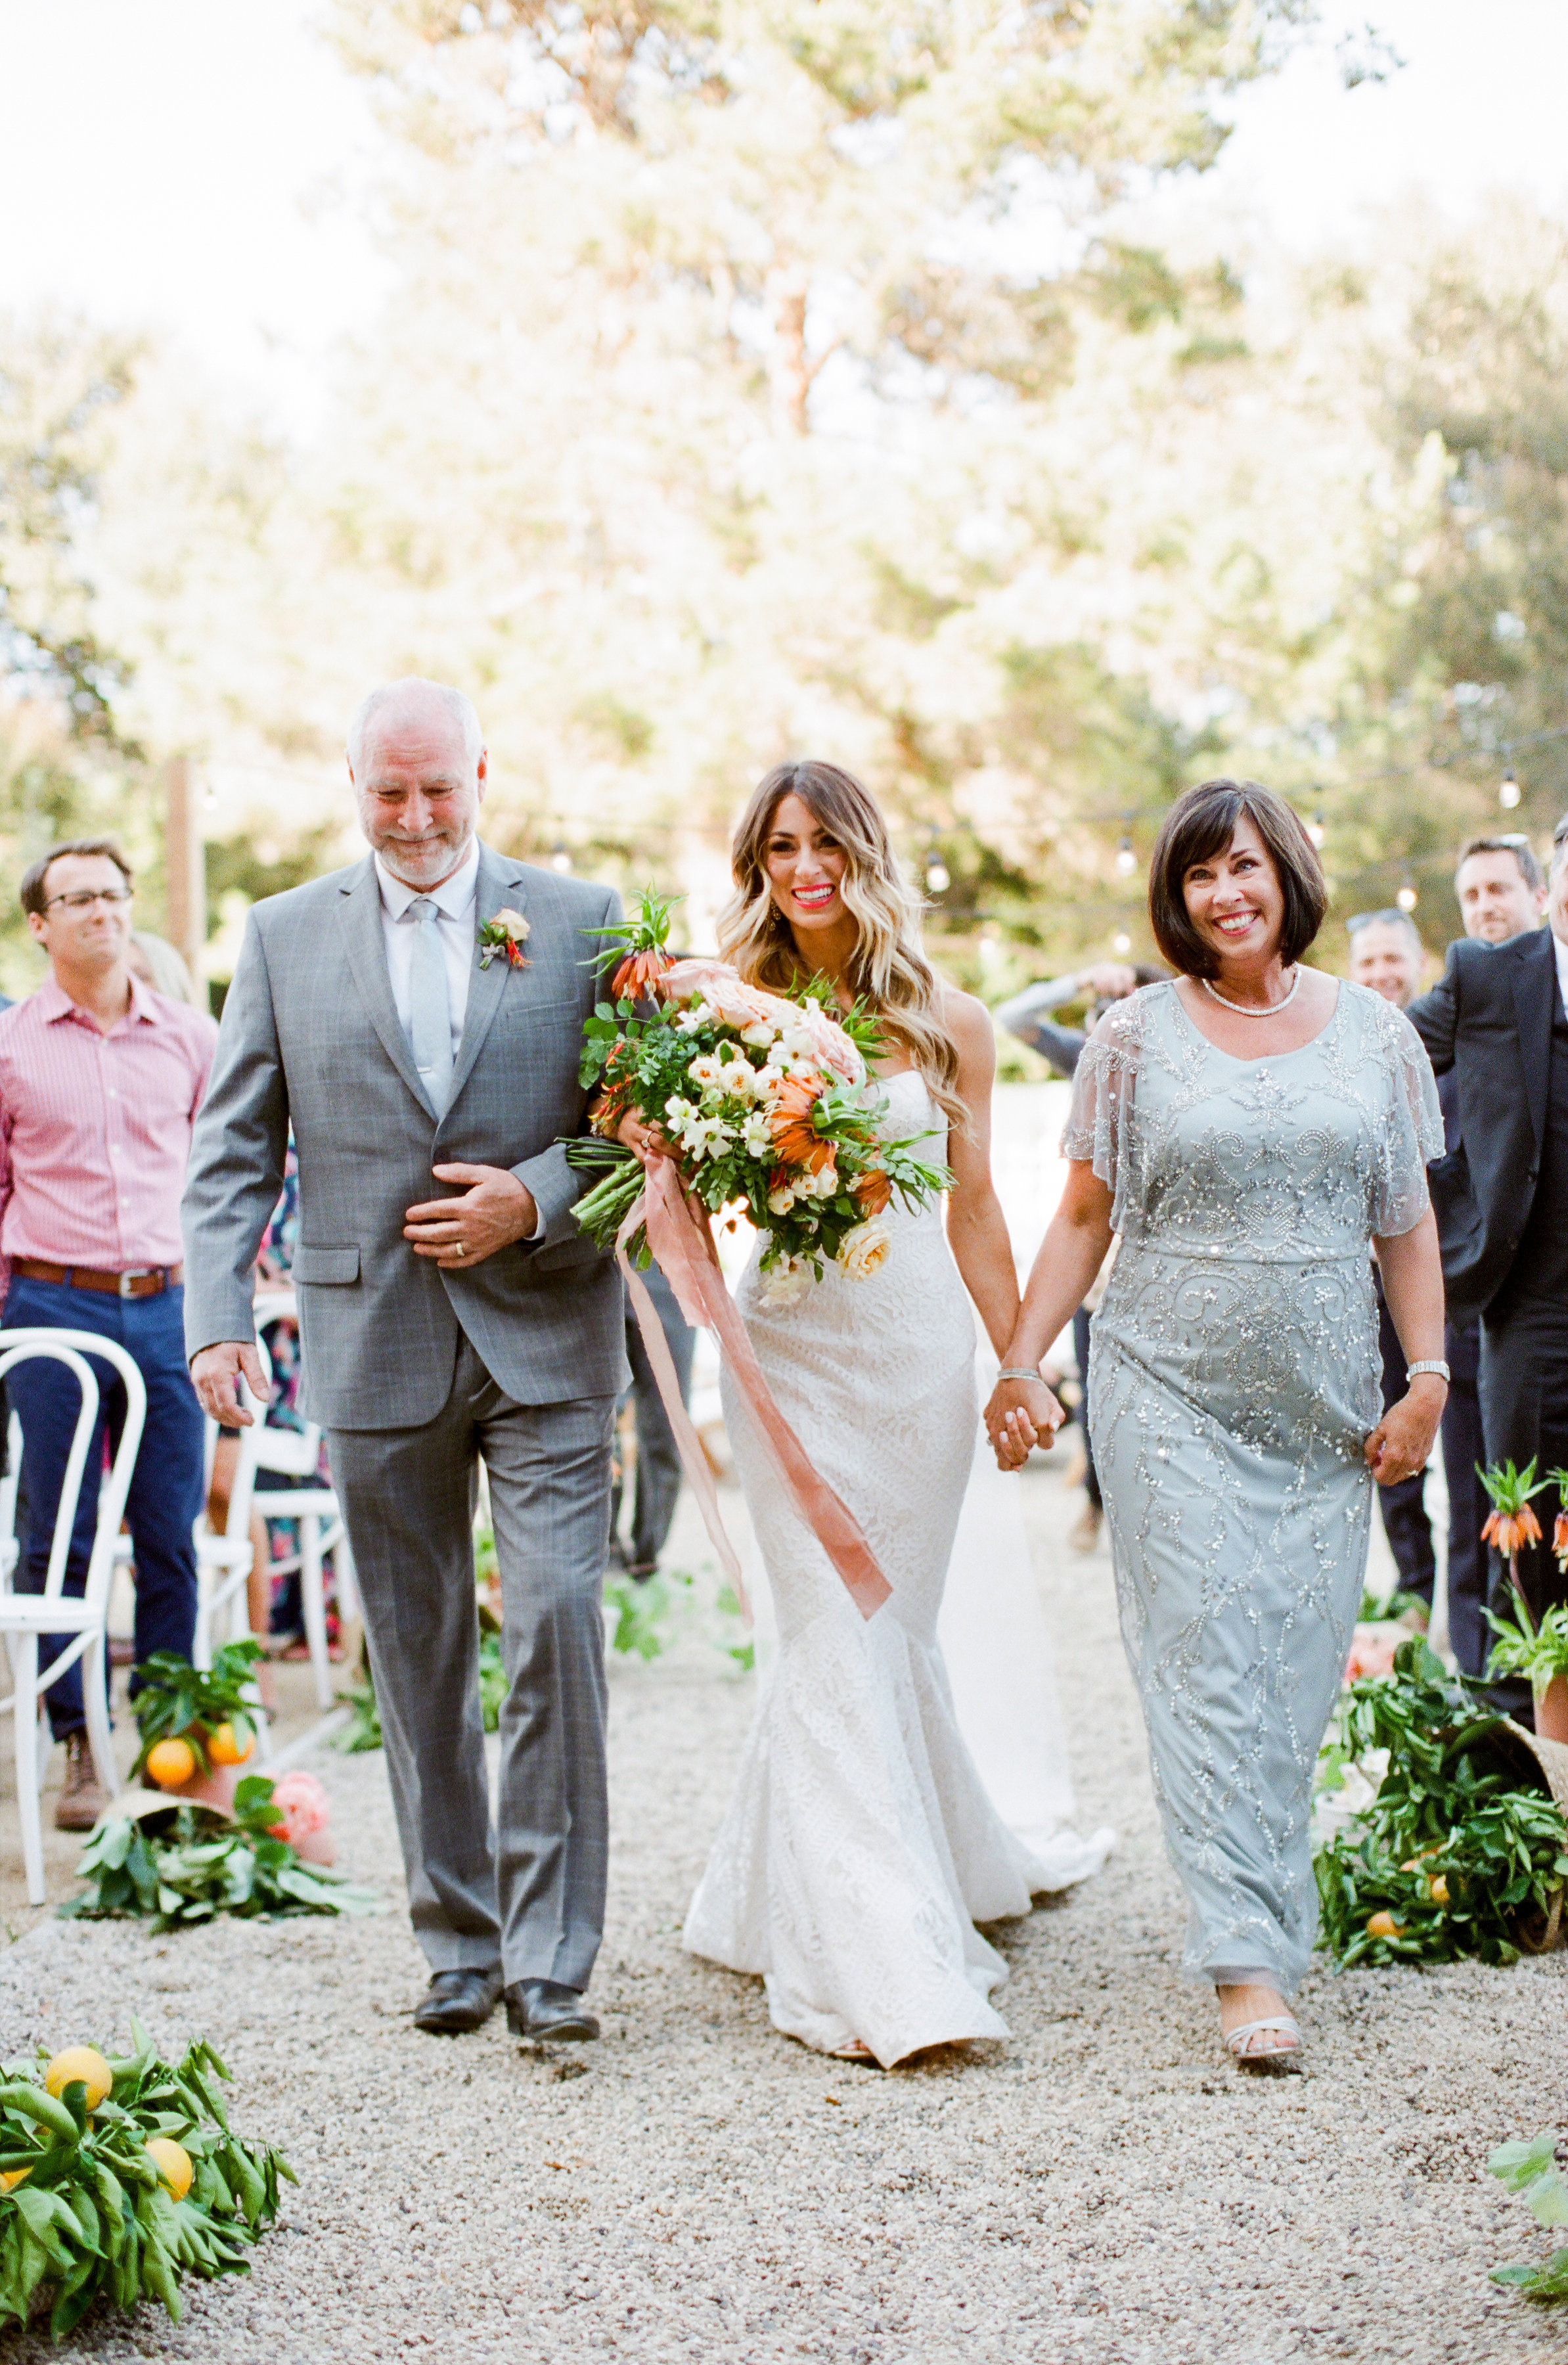 Tenley molzahn taylor leopold wedding processional bride